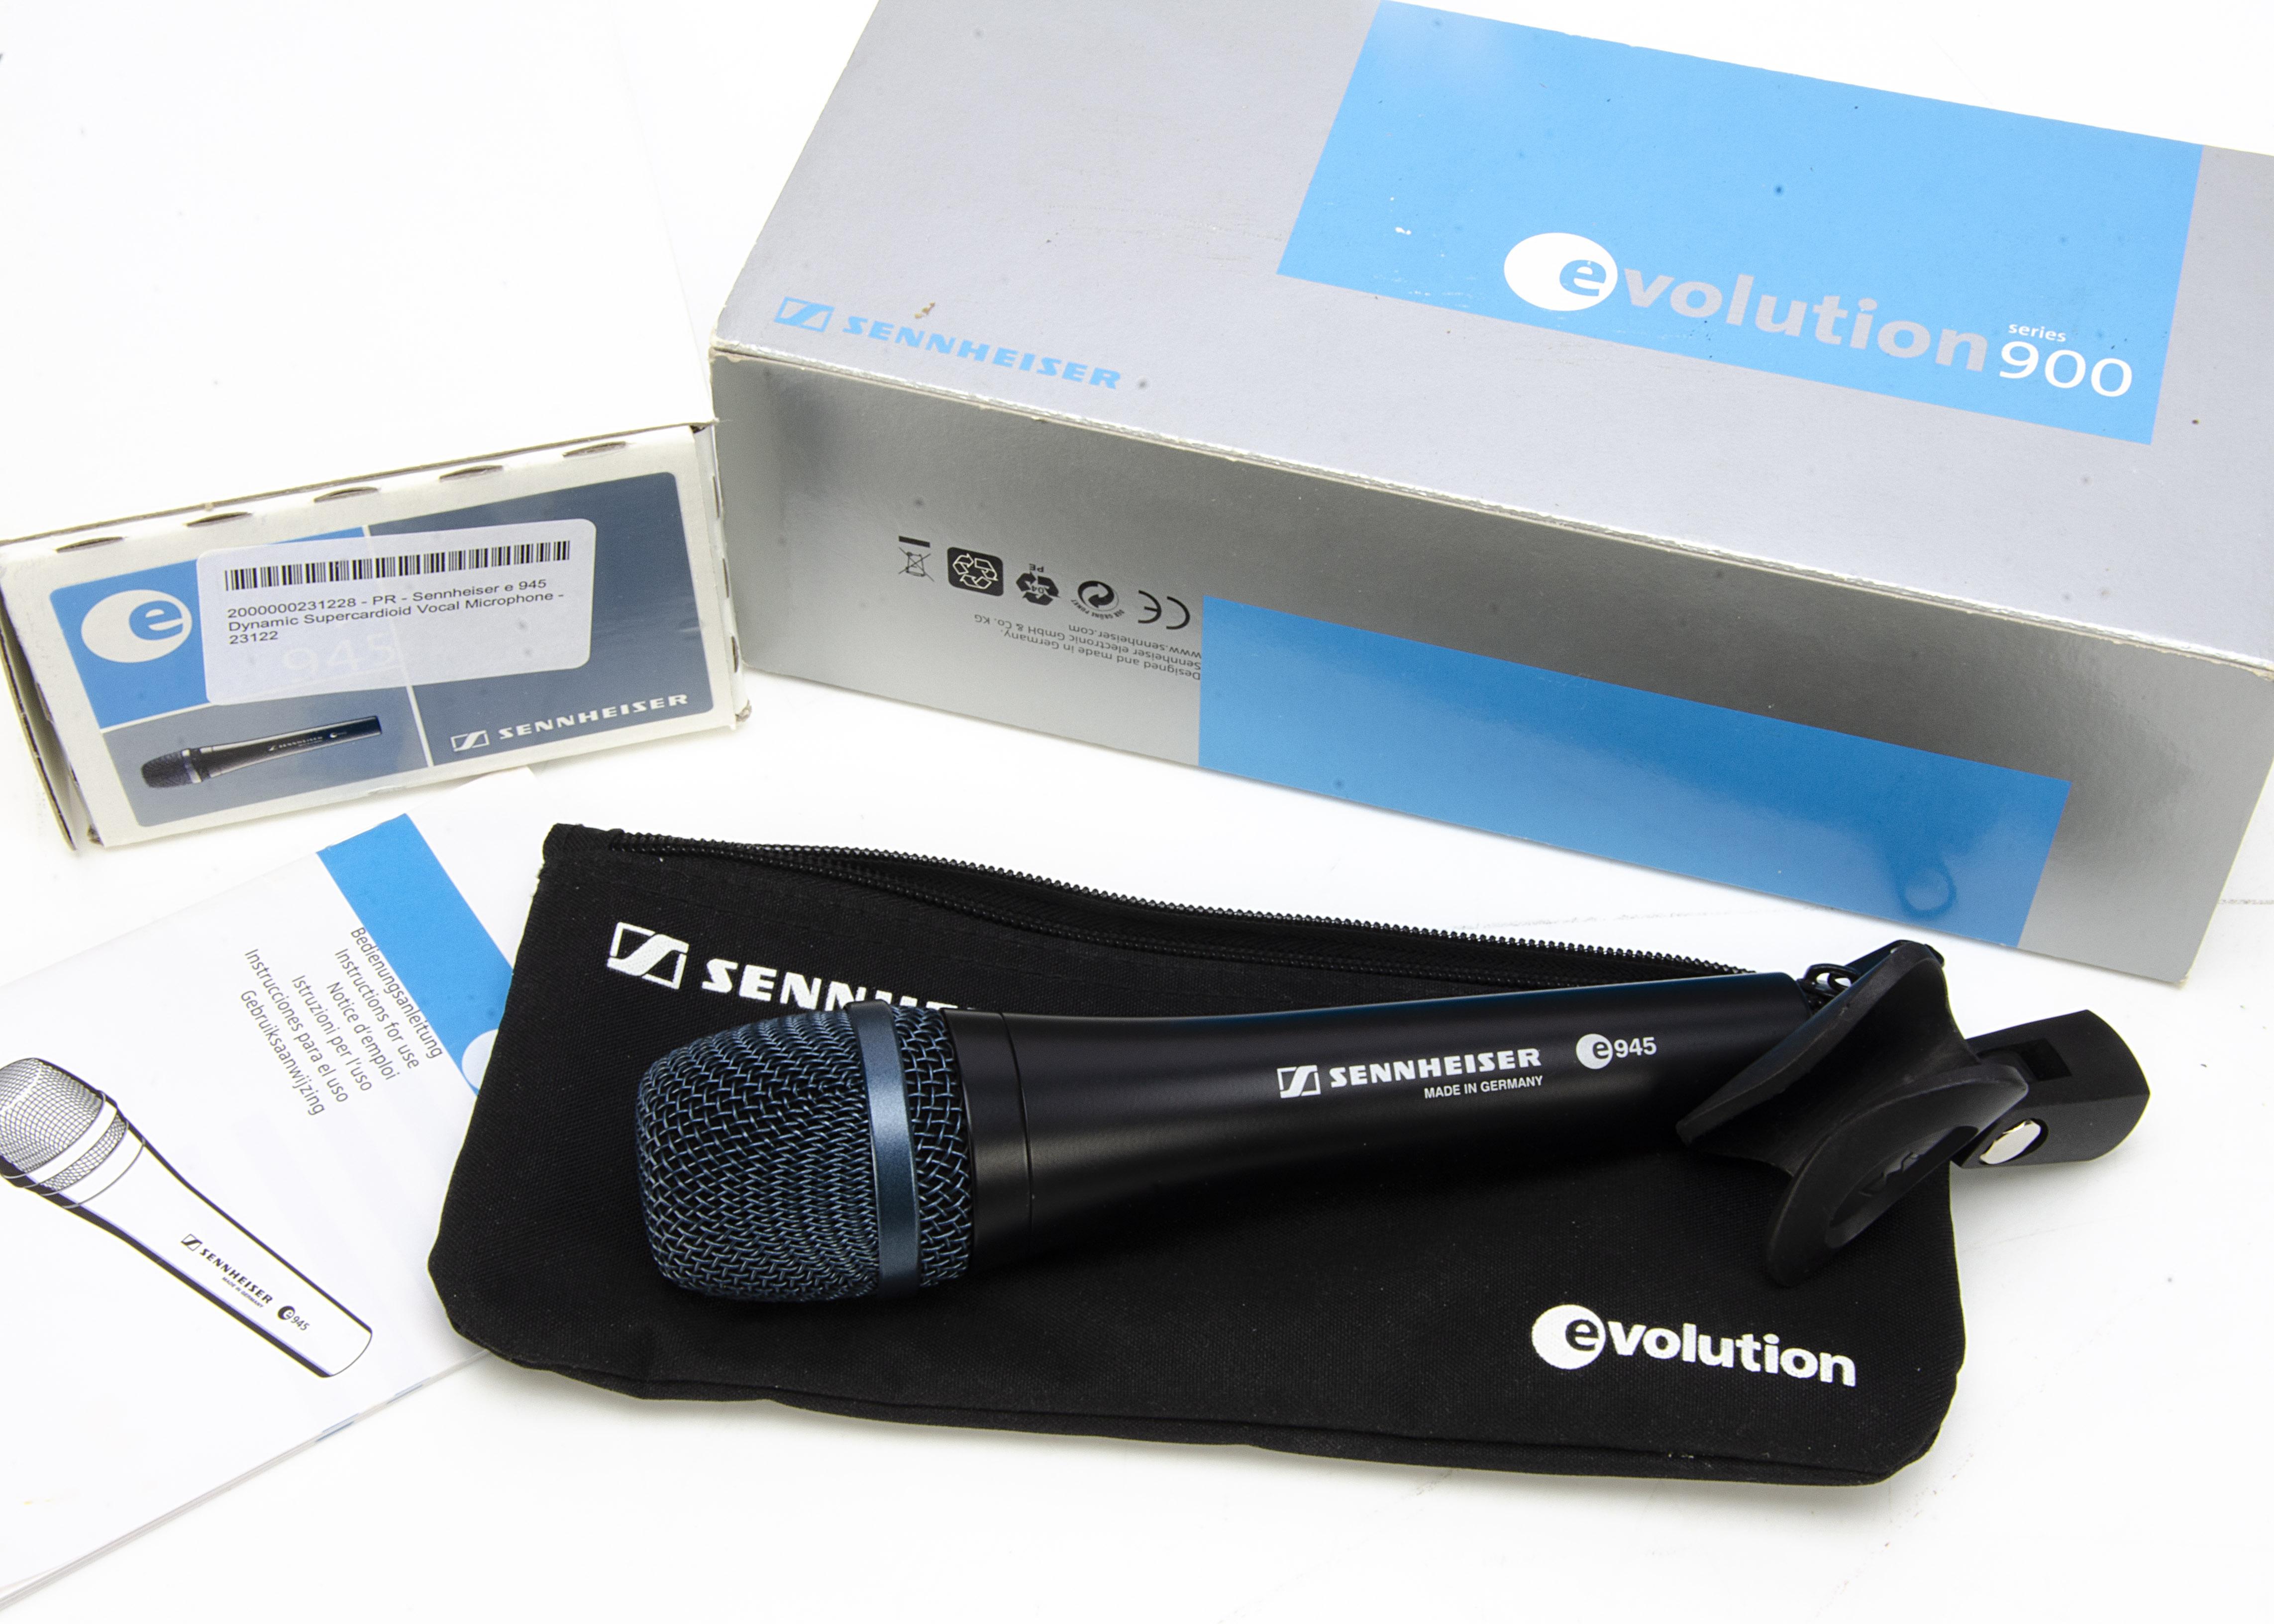 Sennheiser Microphone, a Sennheiser 900 E945 Evolution microphone with carry case, stand attachment,